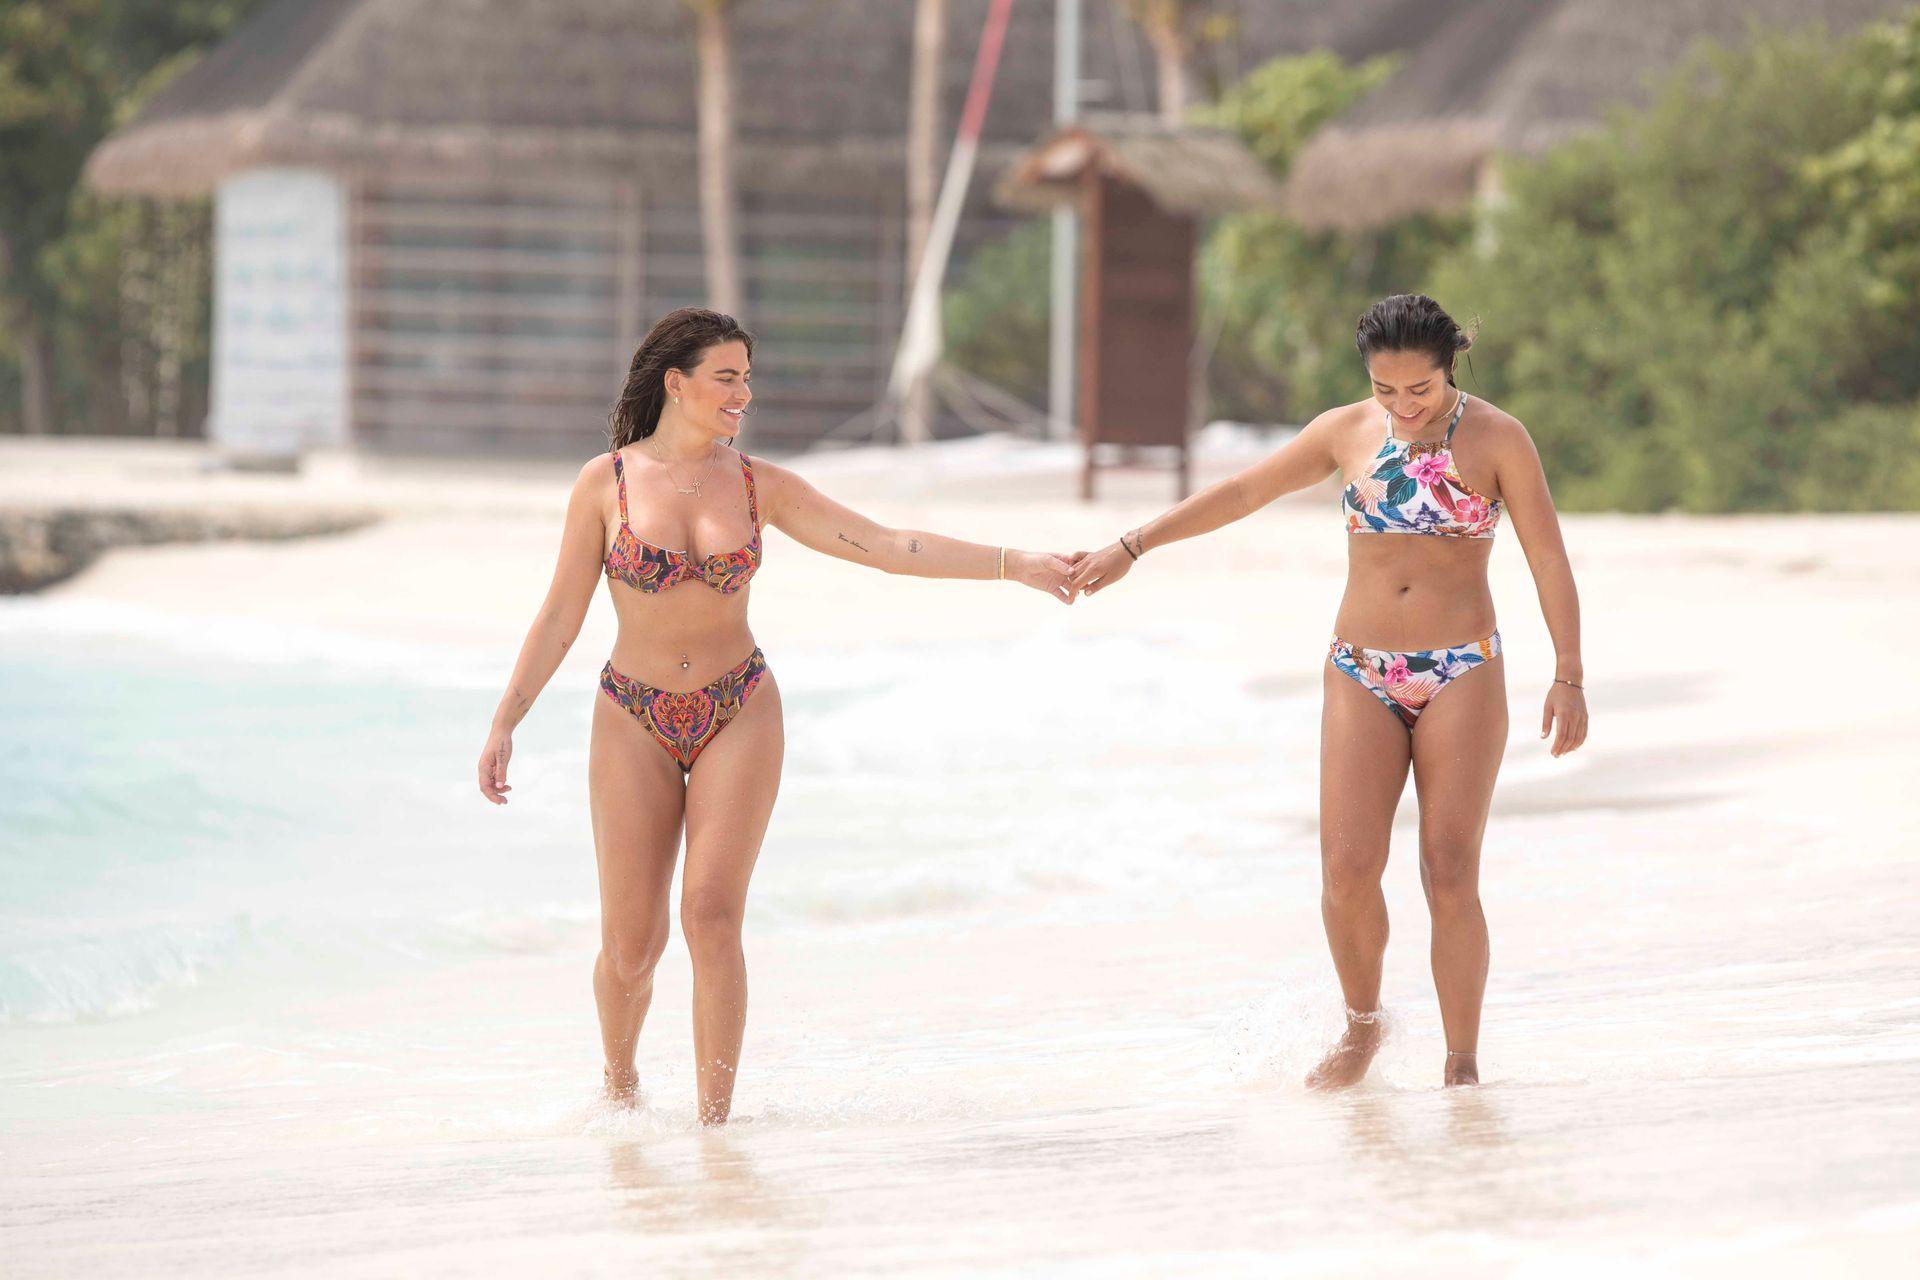 Megan Barton Hanson And Her Girlfriend Seen Enjoying Their Lesbian Holiday 0051